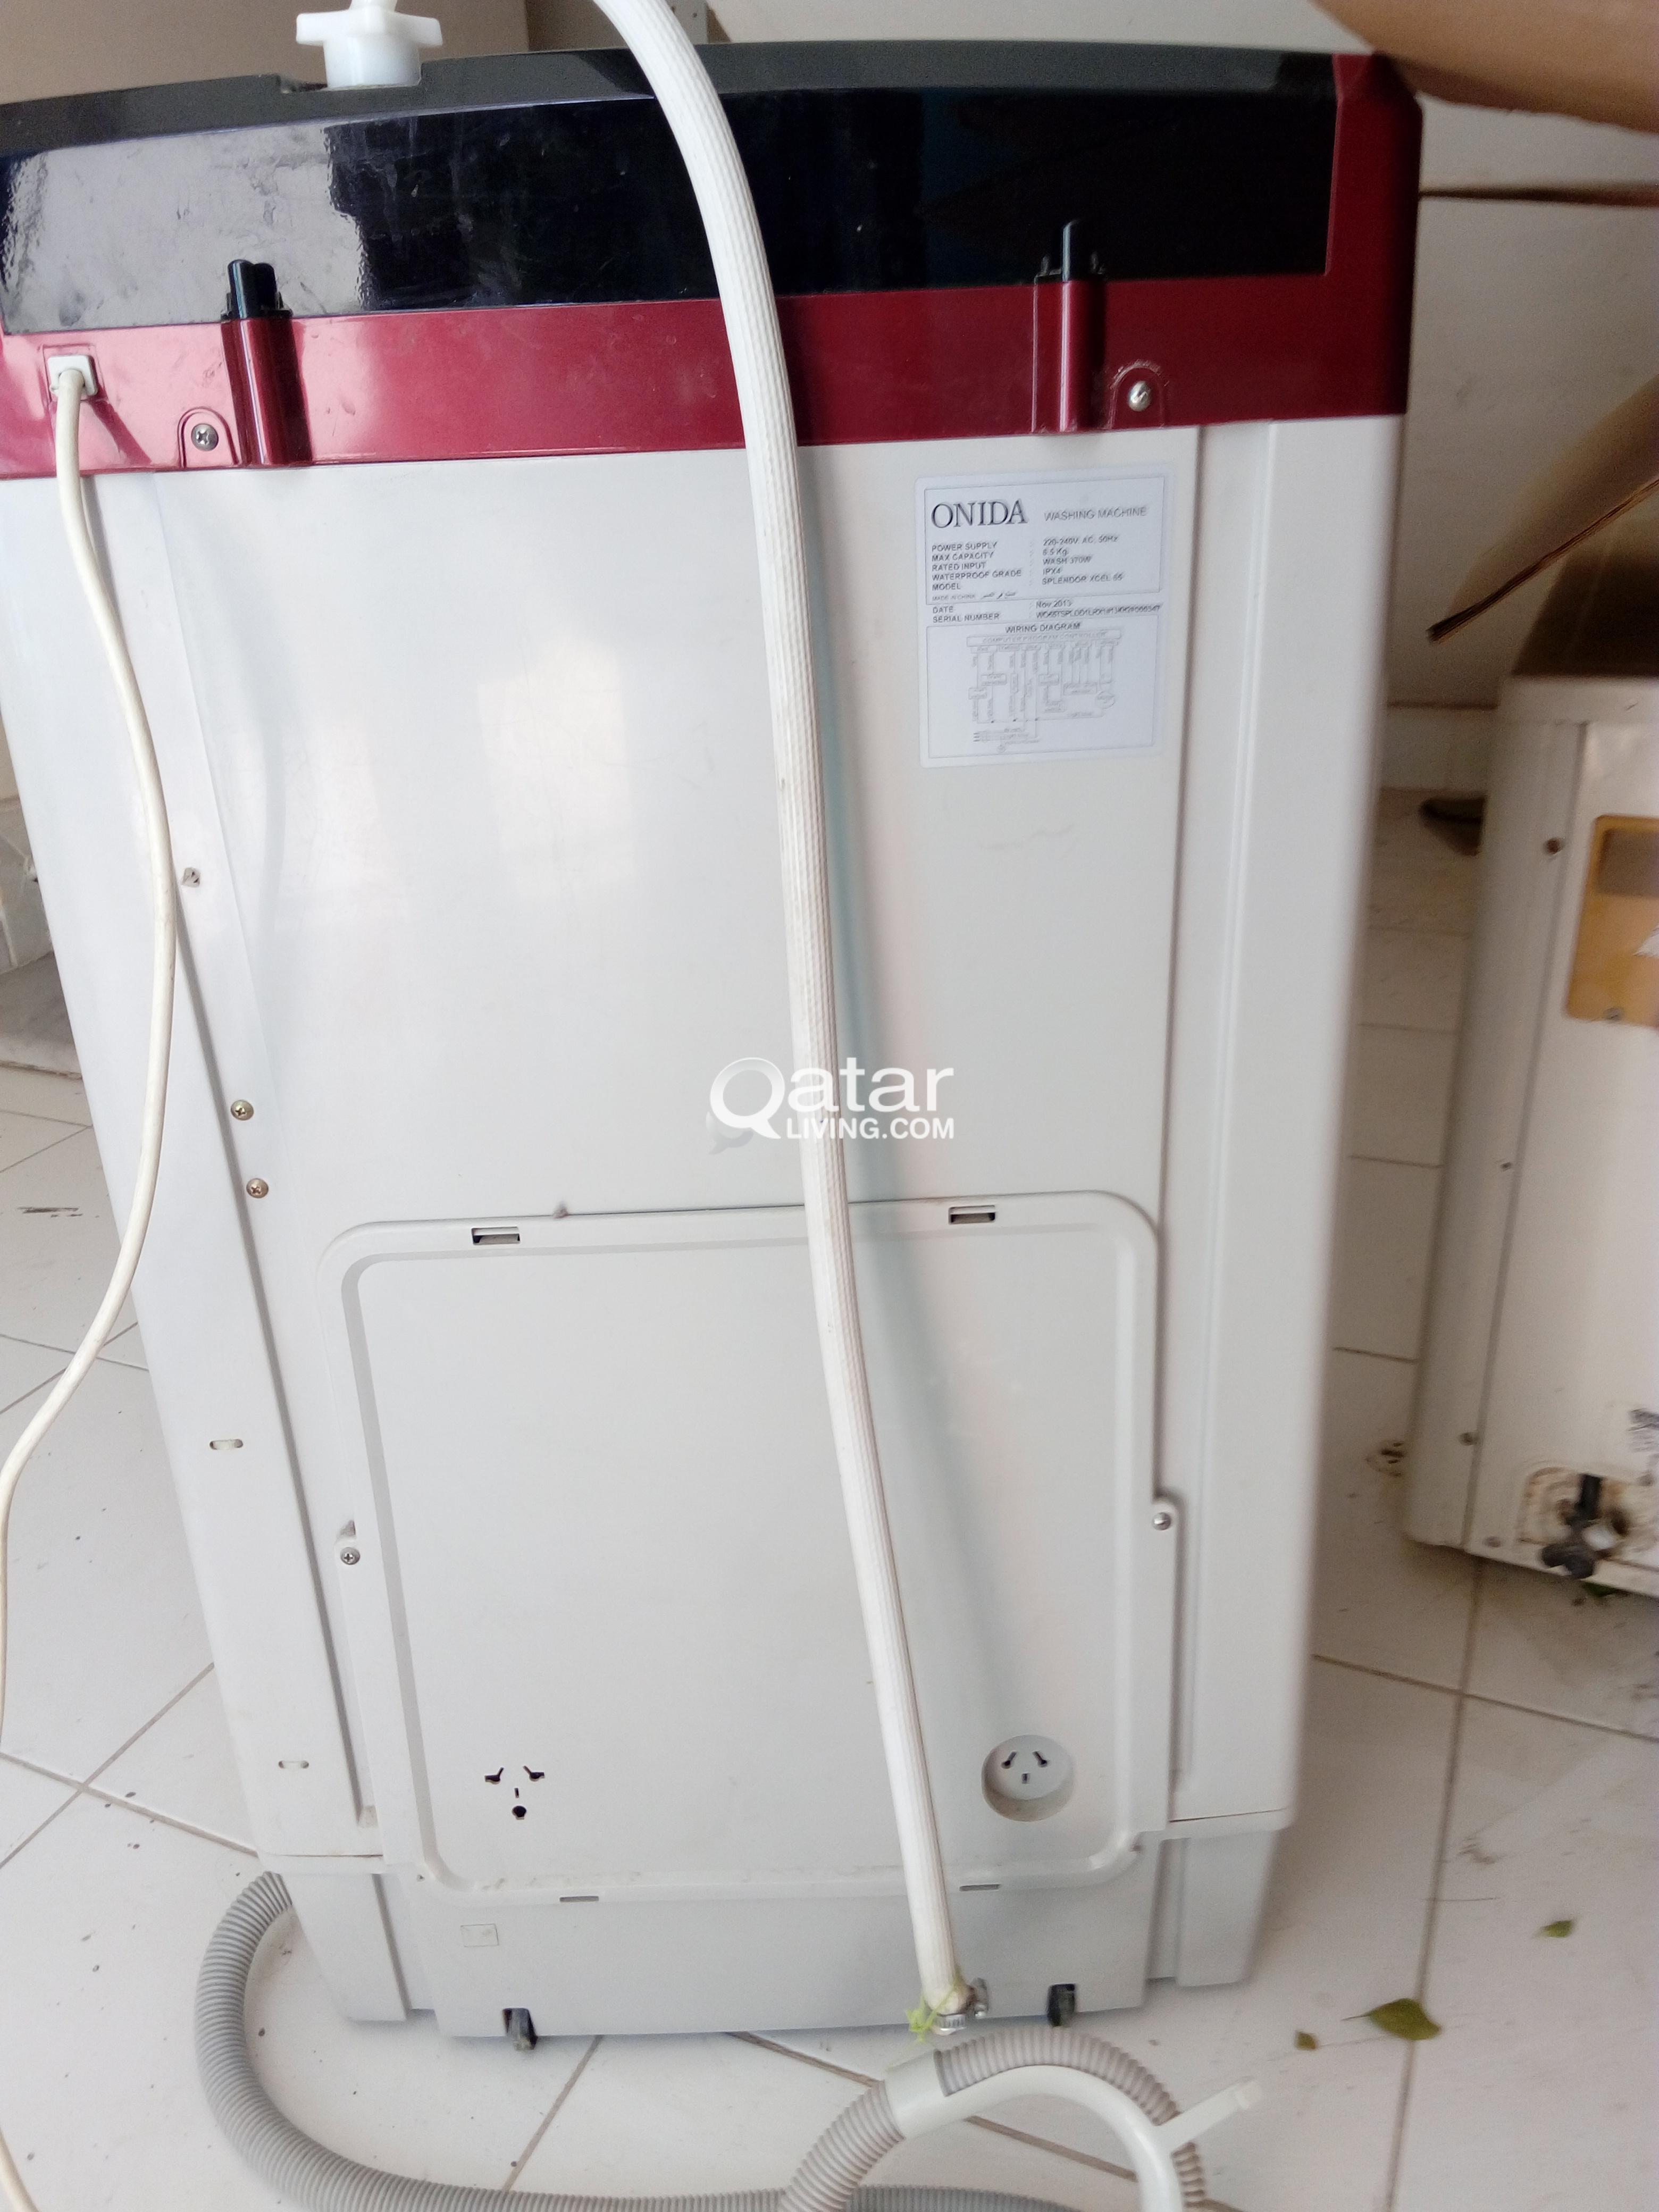 title; title; title; title; title. Information. Onida 6.5kg Splendor Xcel.  Top Load Washing Machine